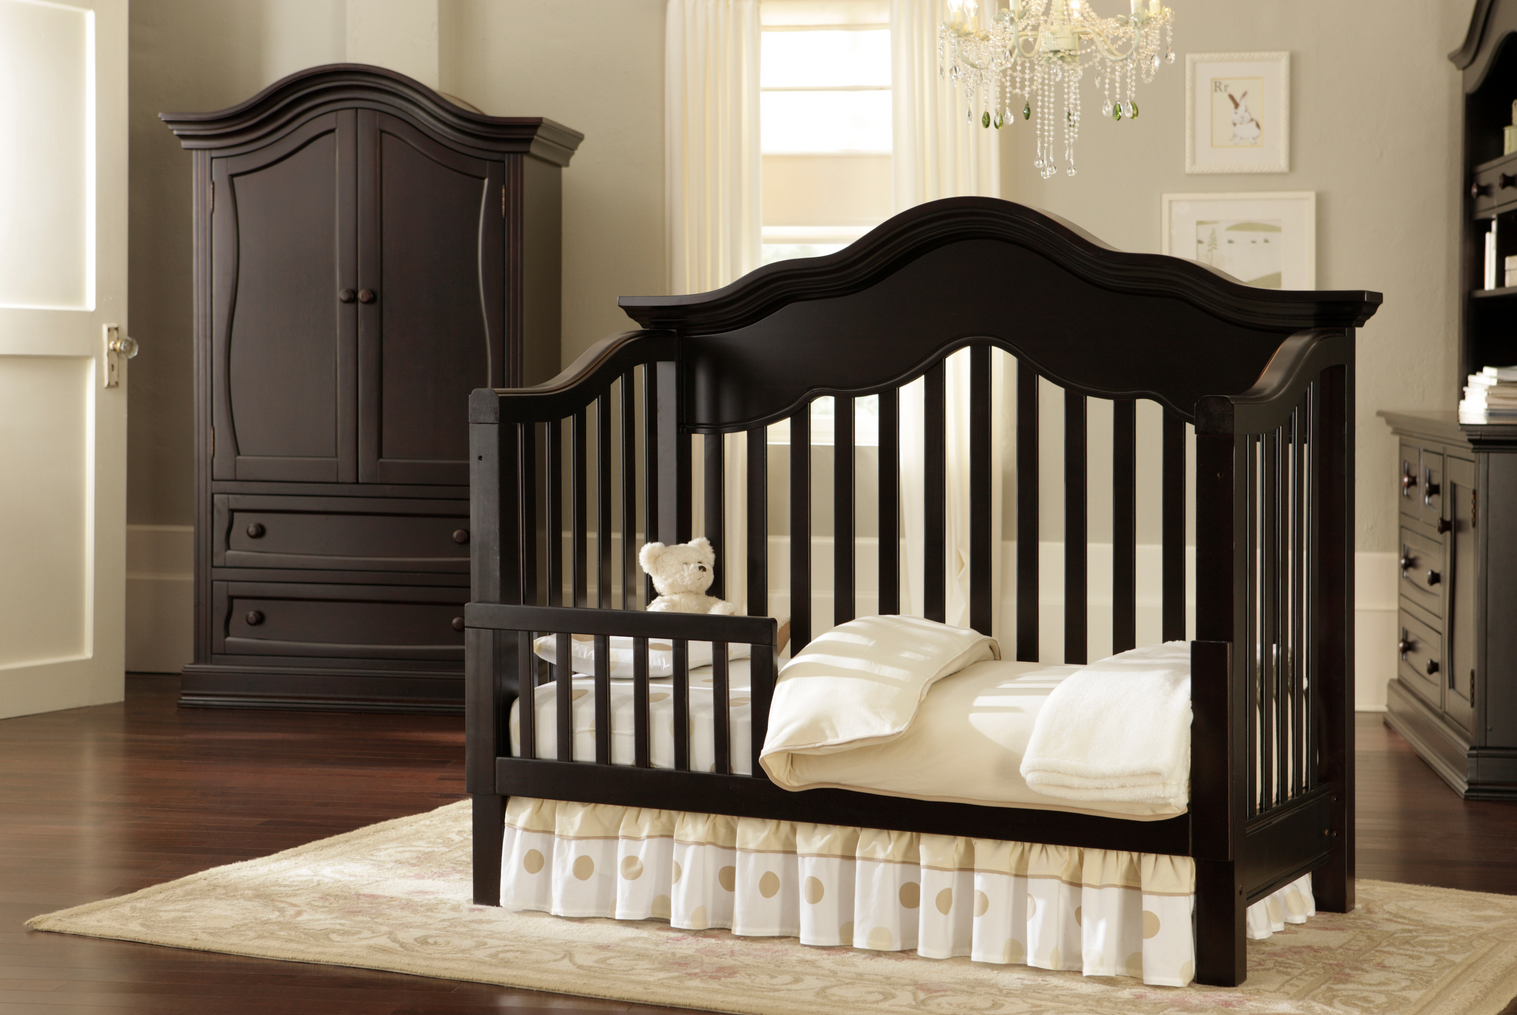 Millbury Convertible Crib In Espresso Kids Furniture In